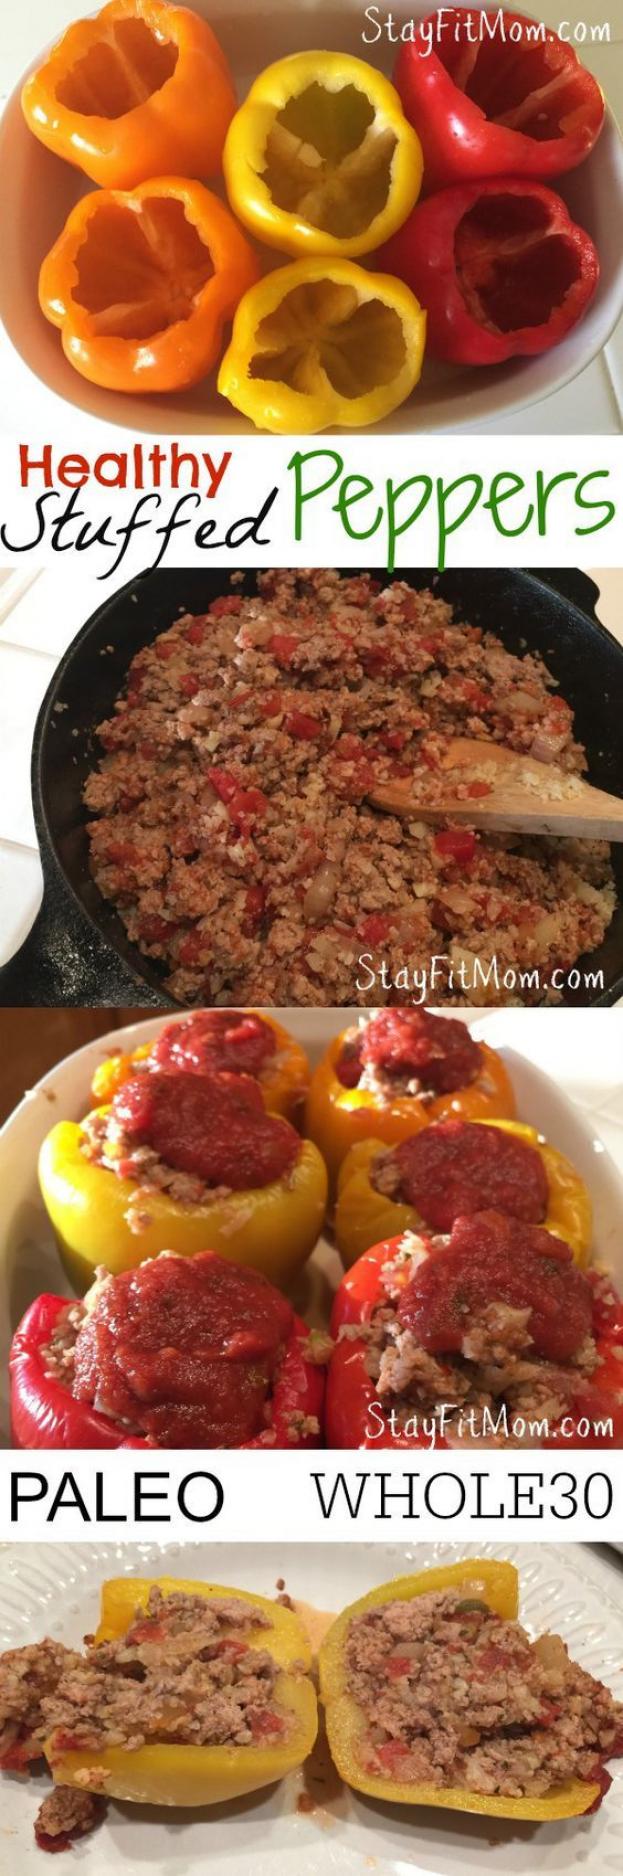 Ground Turkey and Cauliflower Rice Stuffed Peppers Whole